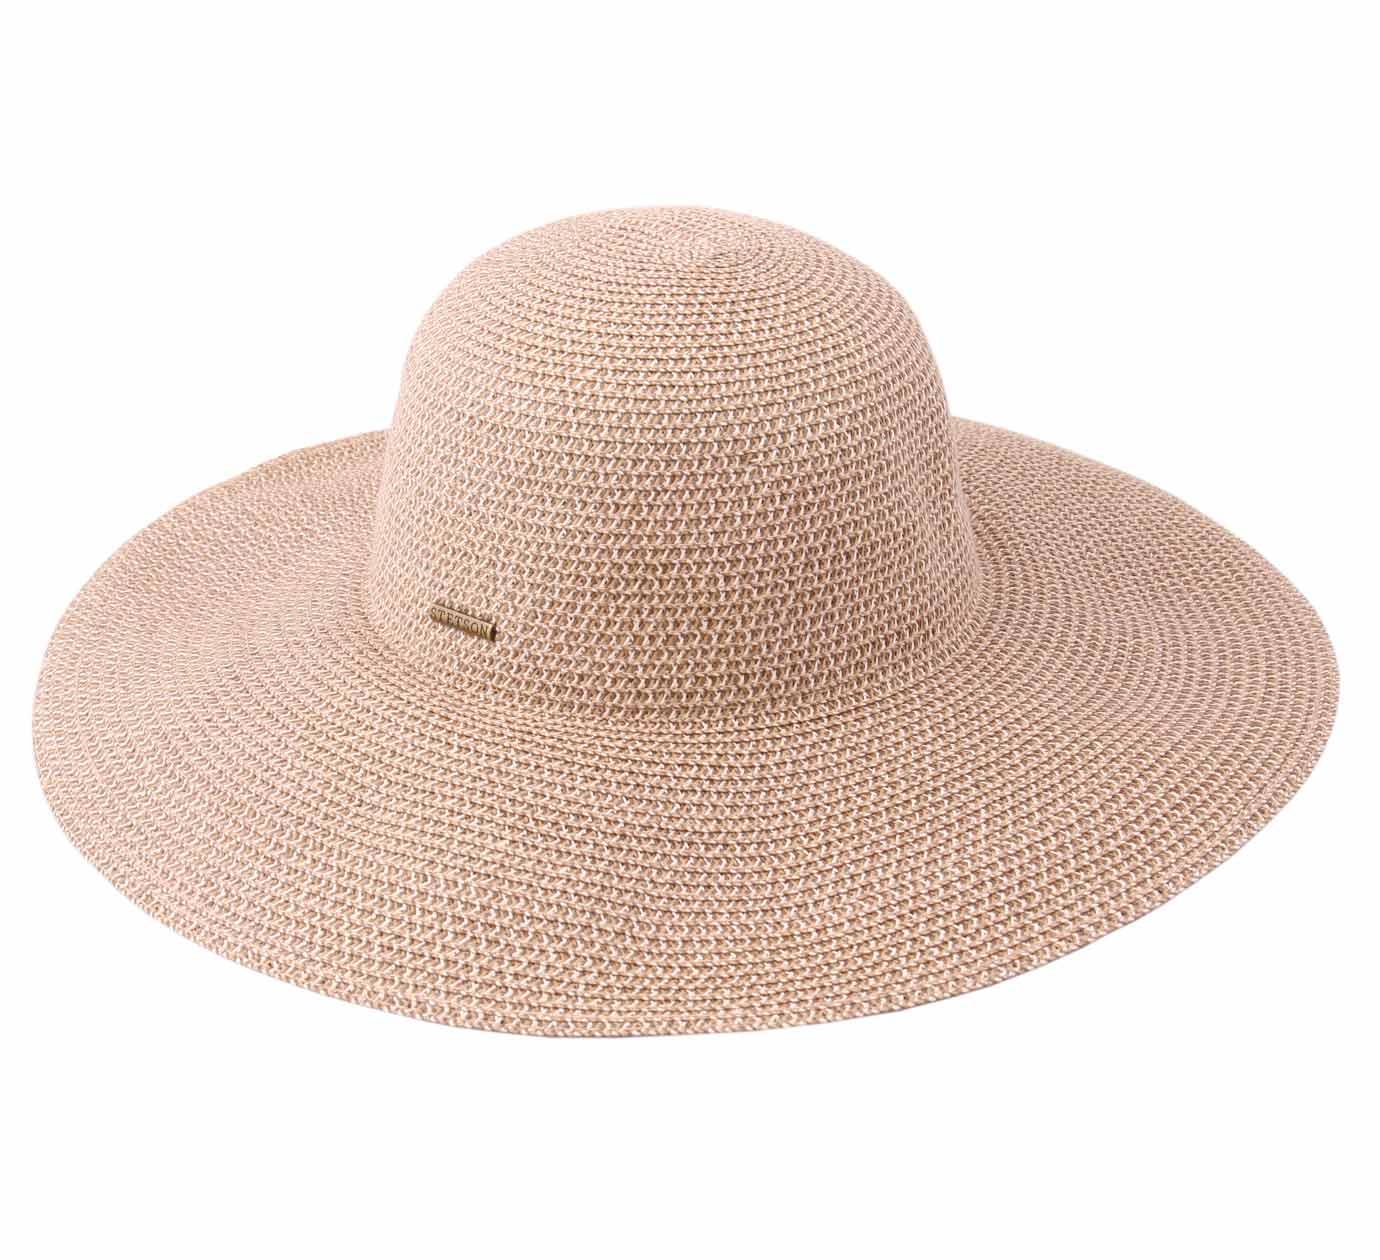 be52ce60eb6 Toyo Flapper - Hats Stetson